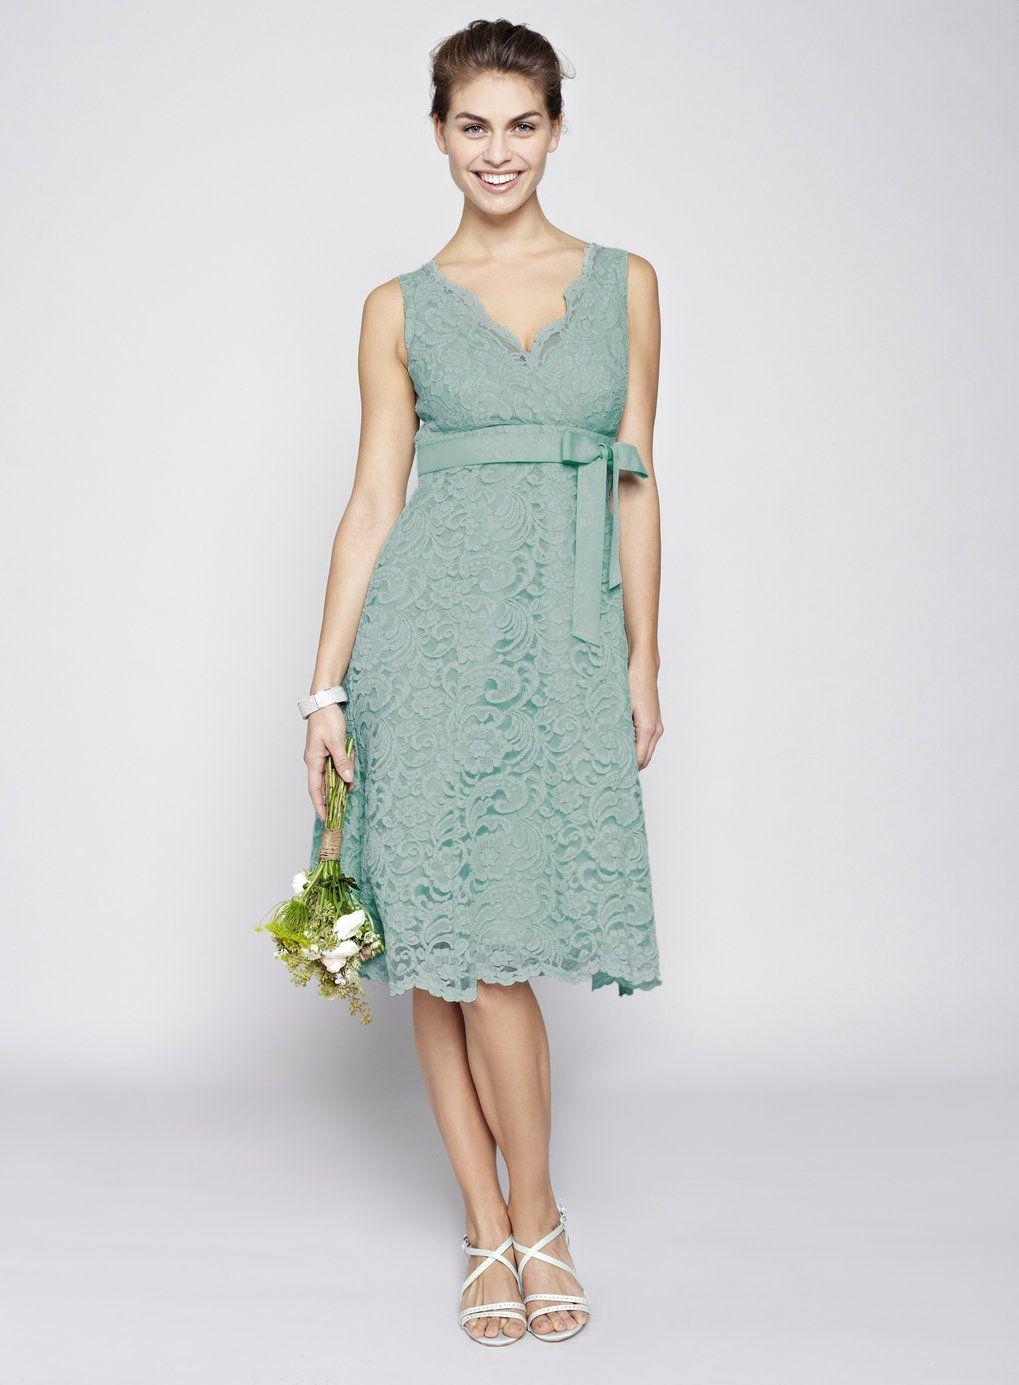 Dark Mint Bella Lace Short Bridesmaid Dress - BHS   bridesmaid ...